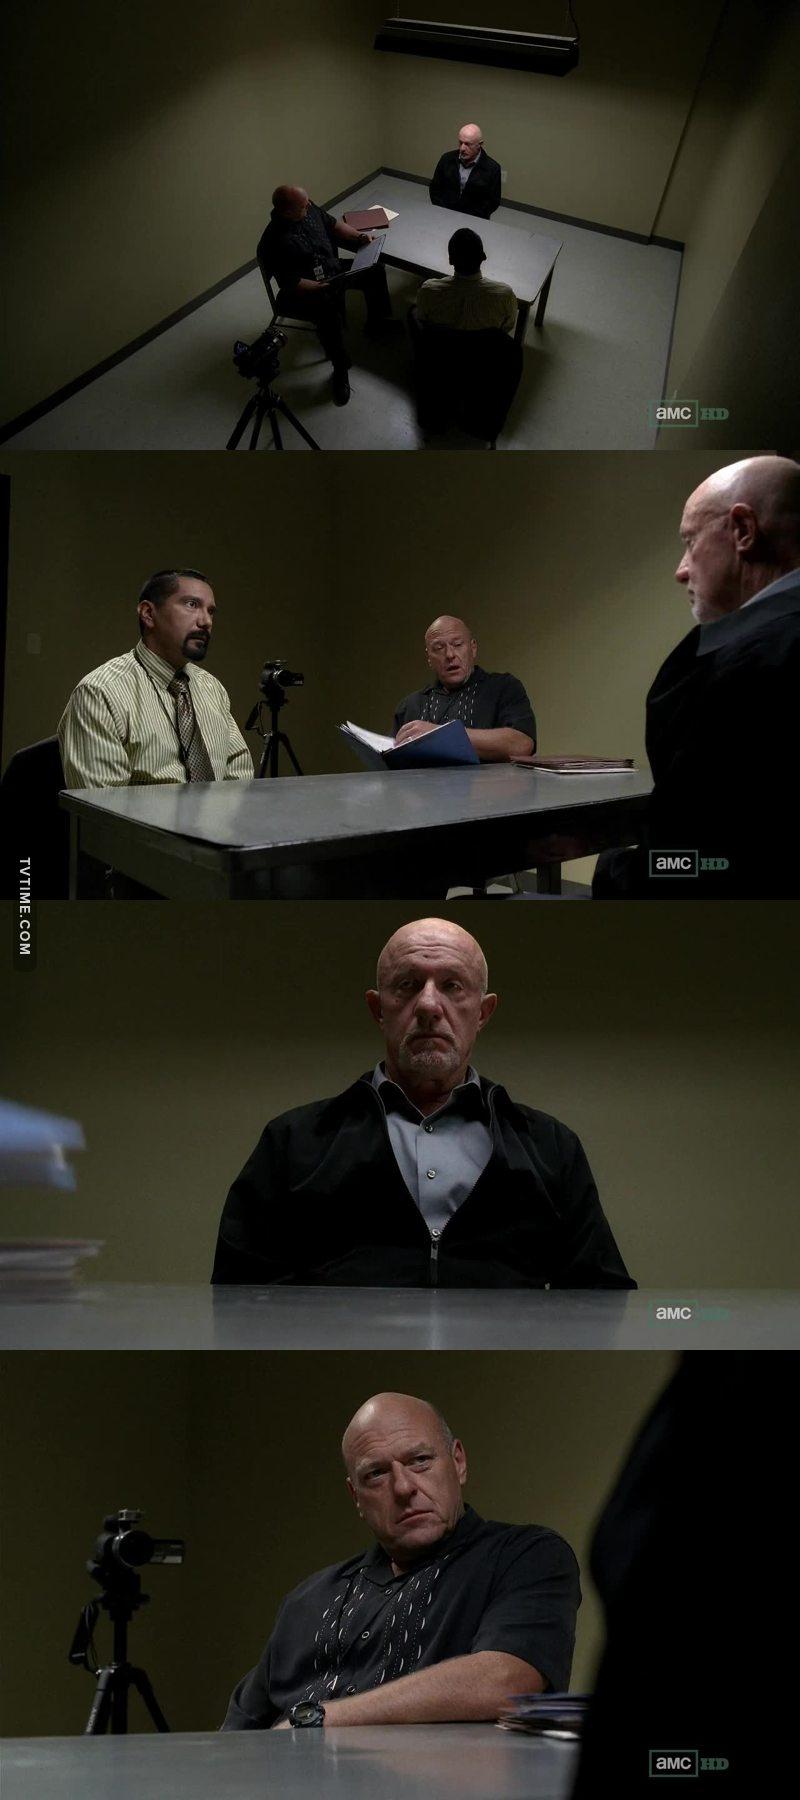 Hank vs mike. Such a good scene!